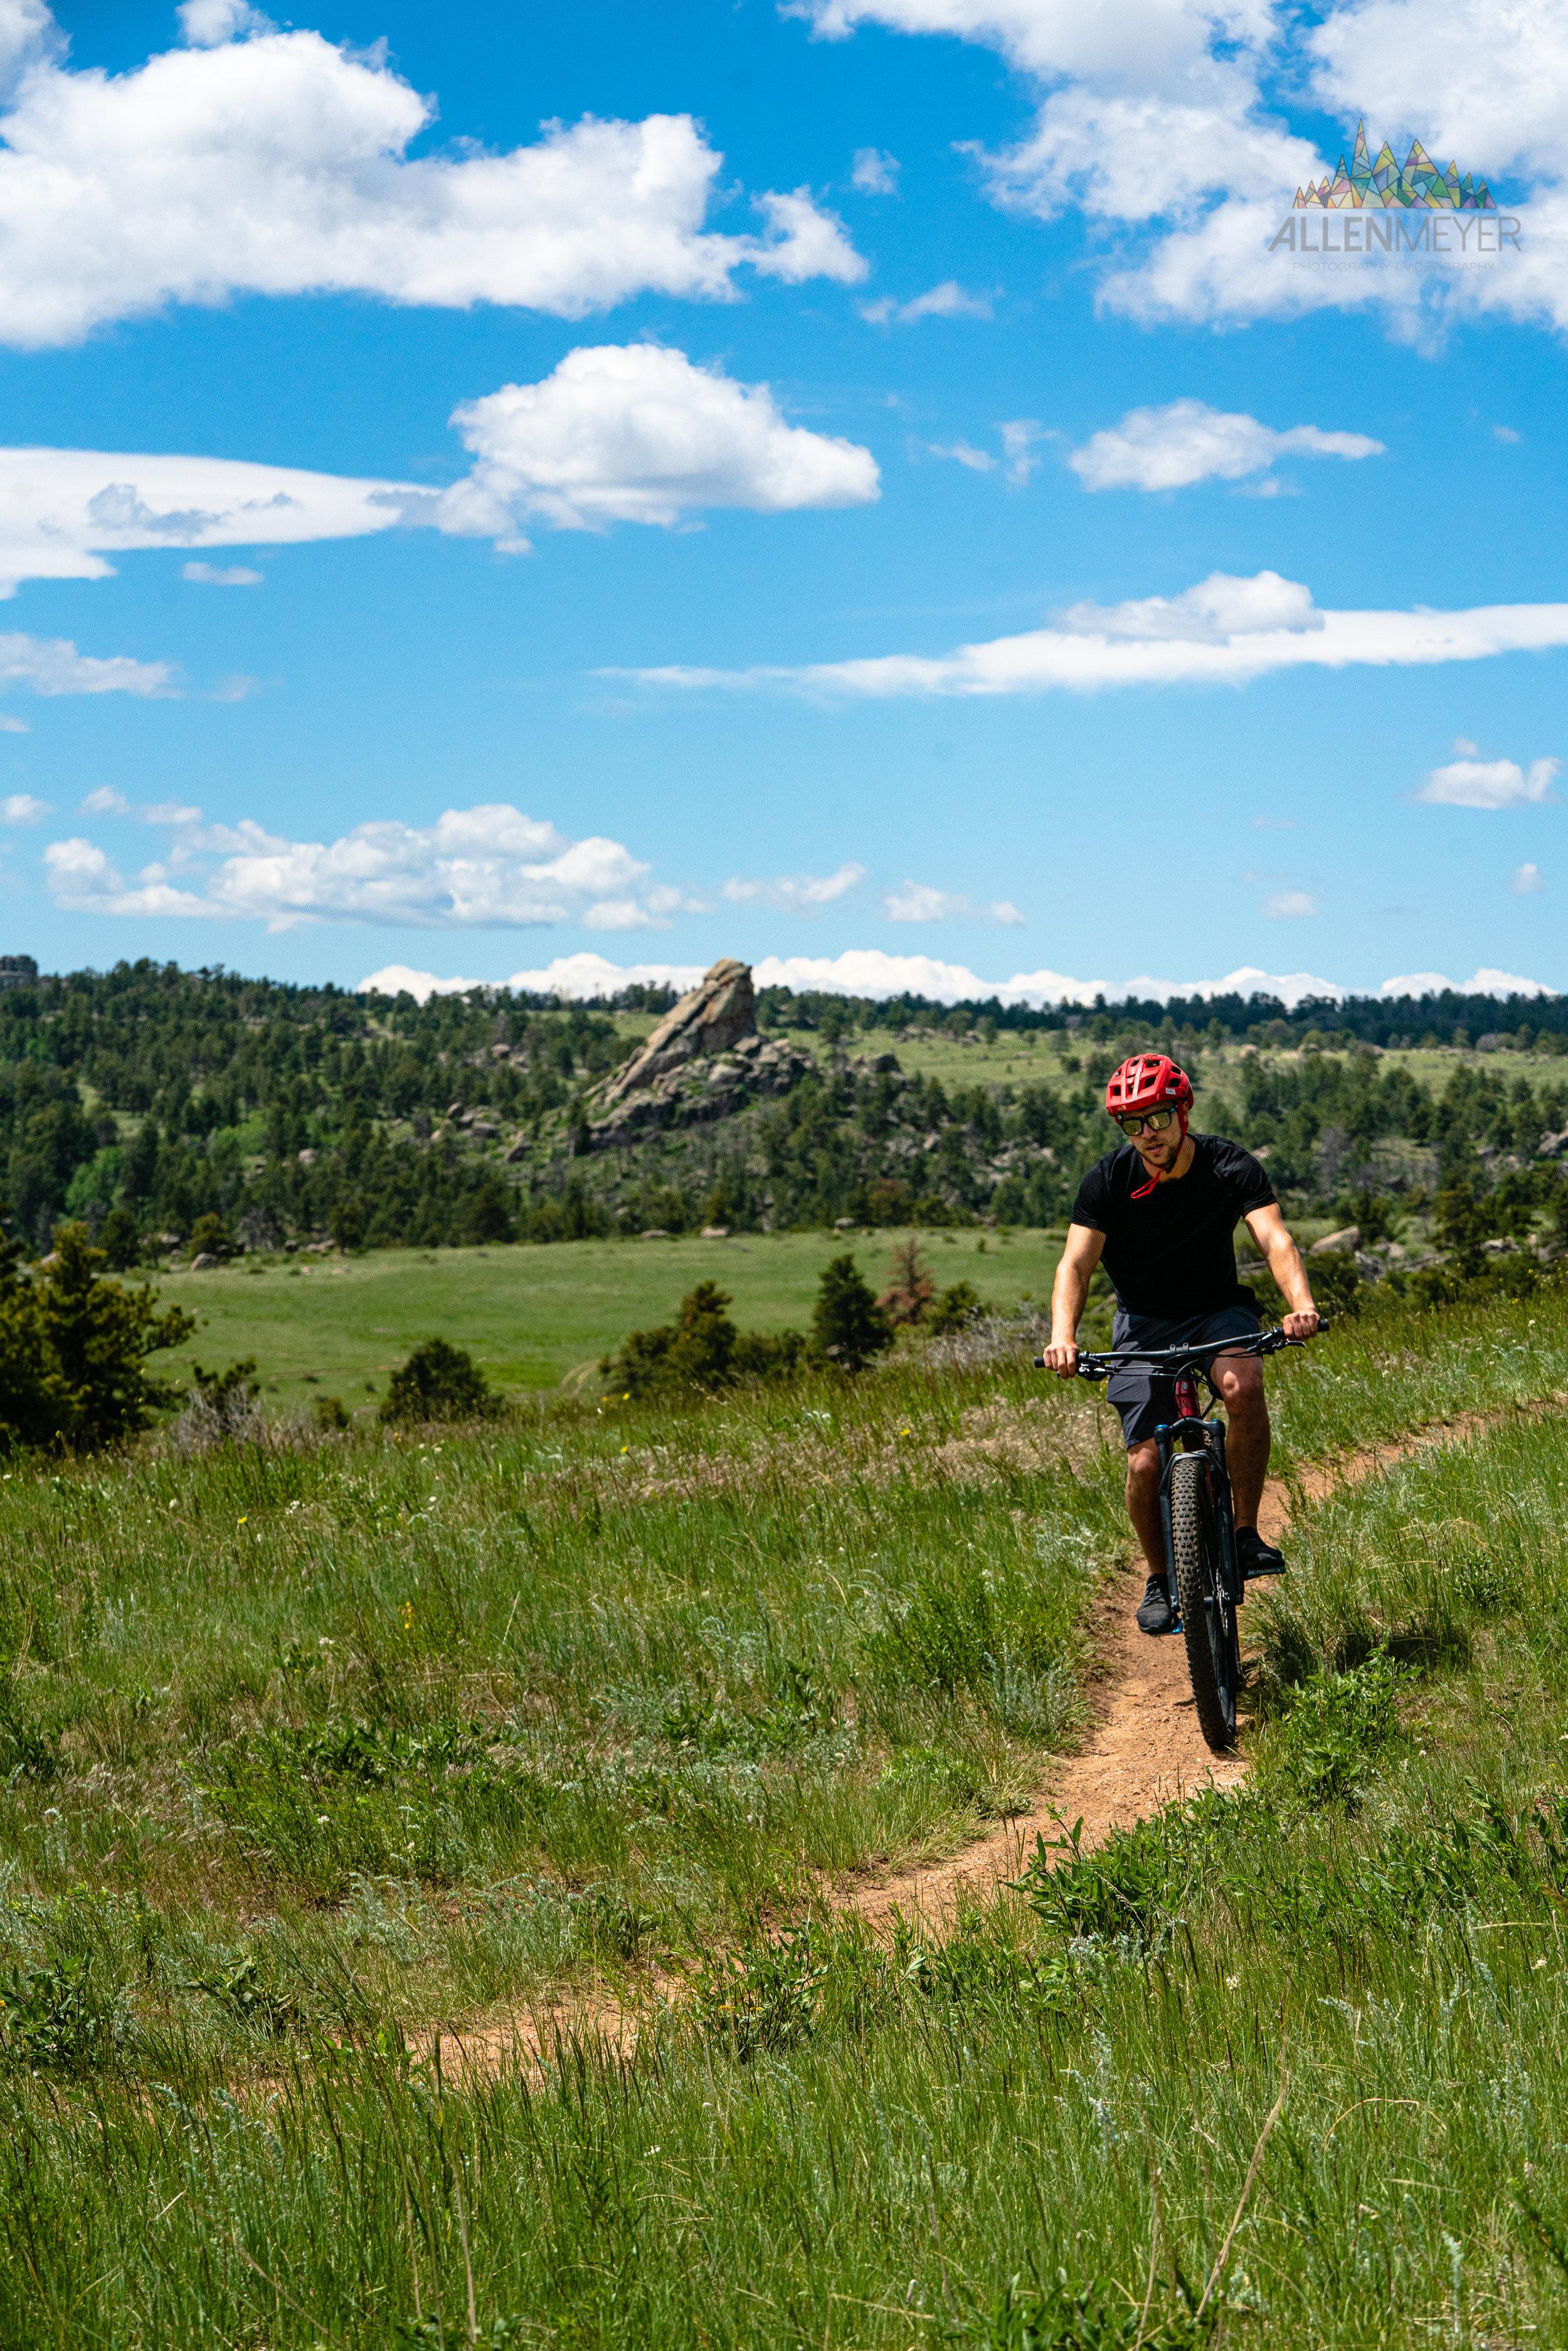 Outdoor Adventures In Cheyenne, Wyoming; Photography by Allen Meyer-05599.jpg